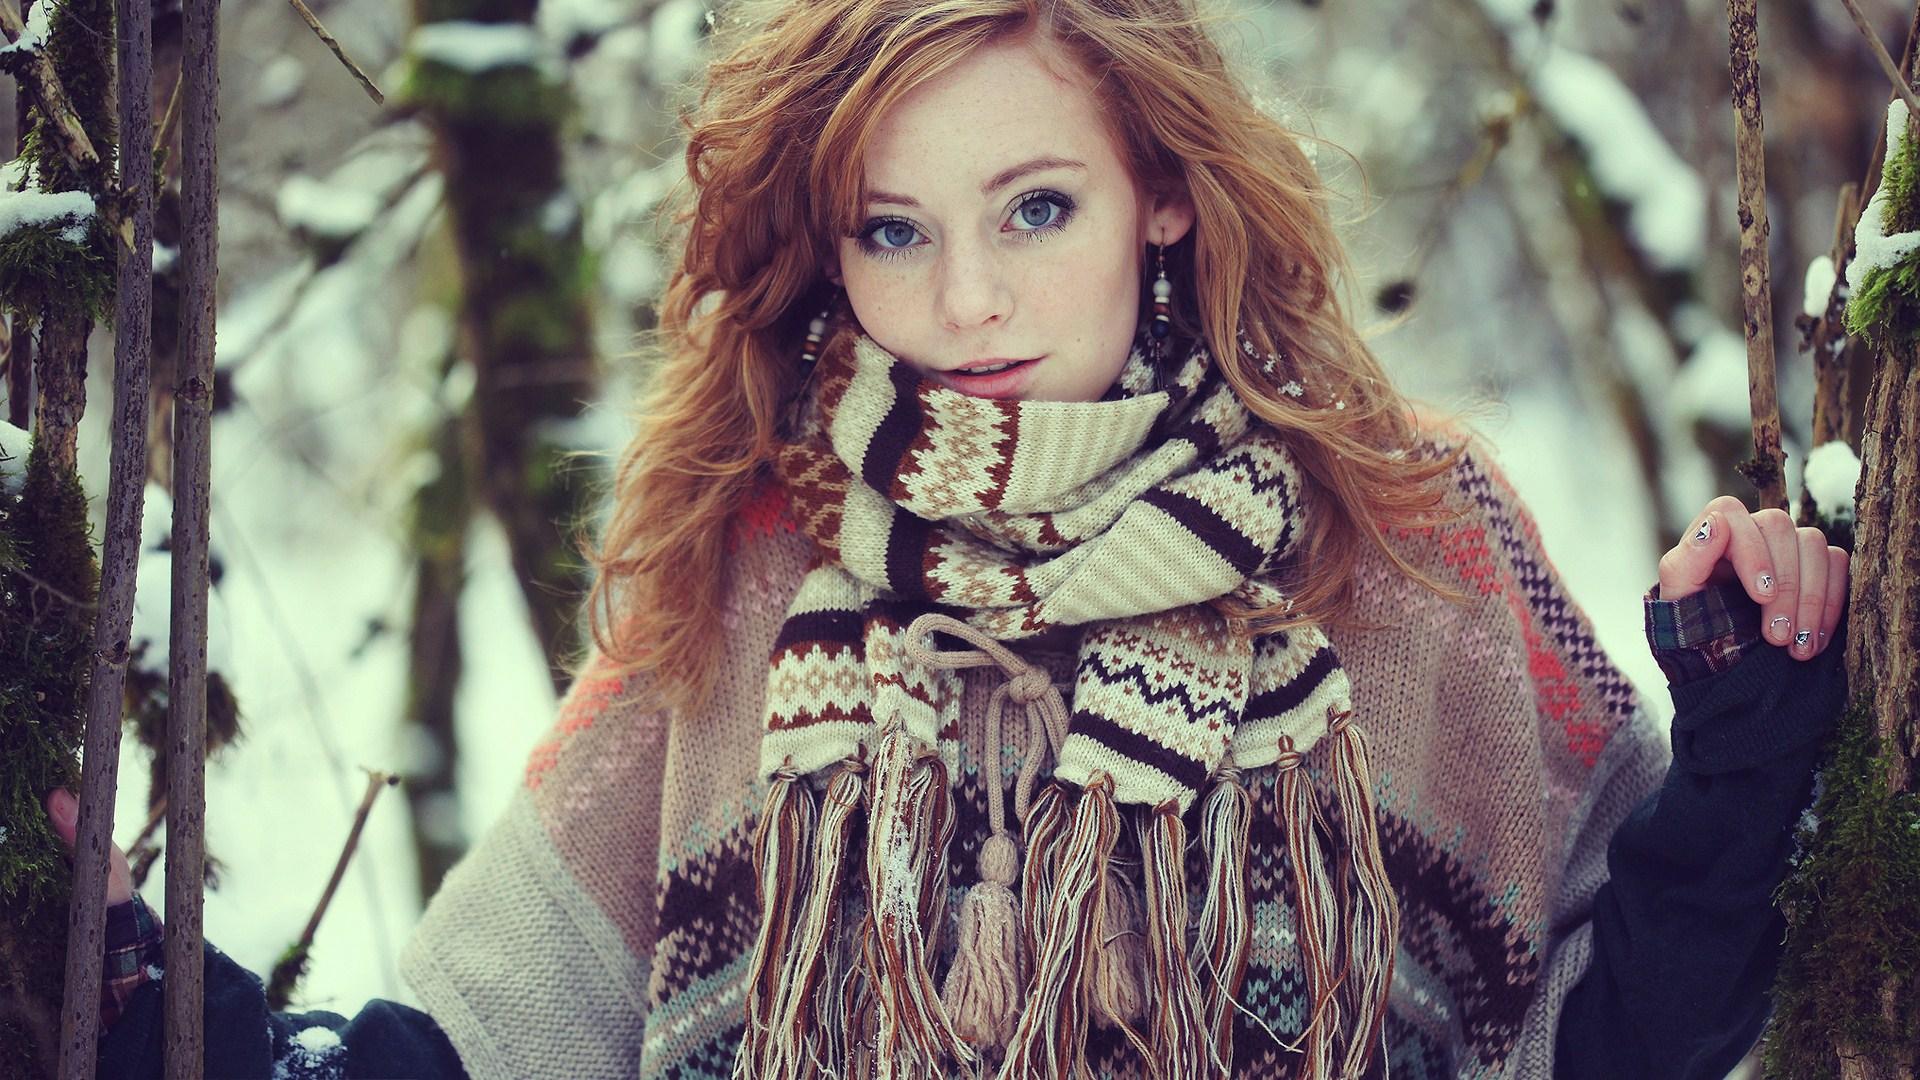 Girl Winter Fashion